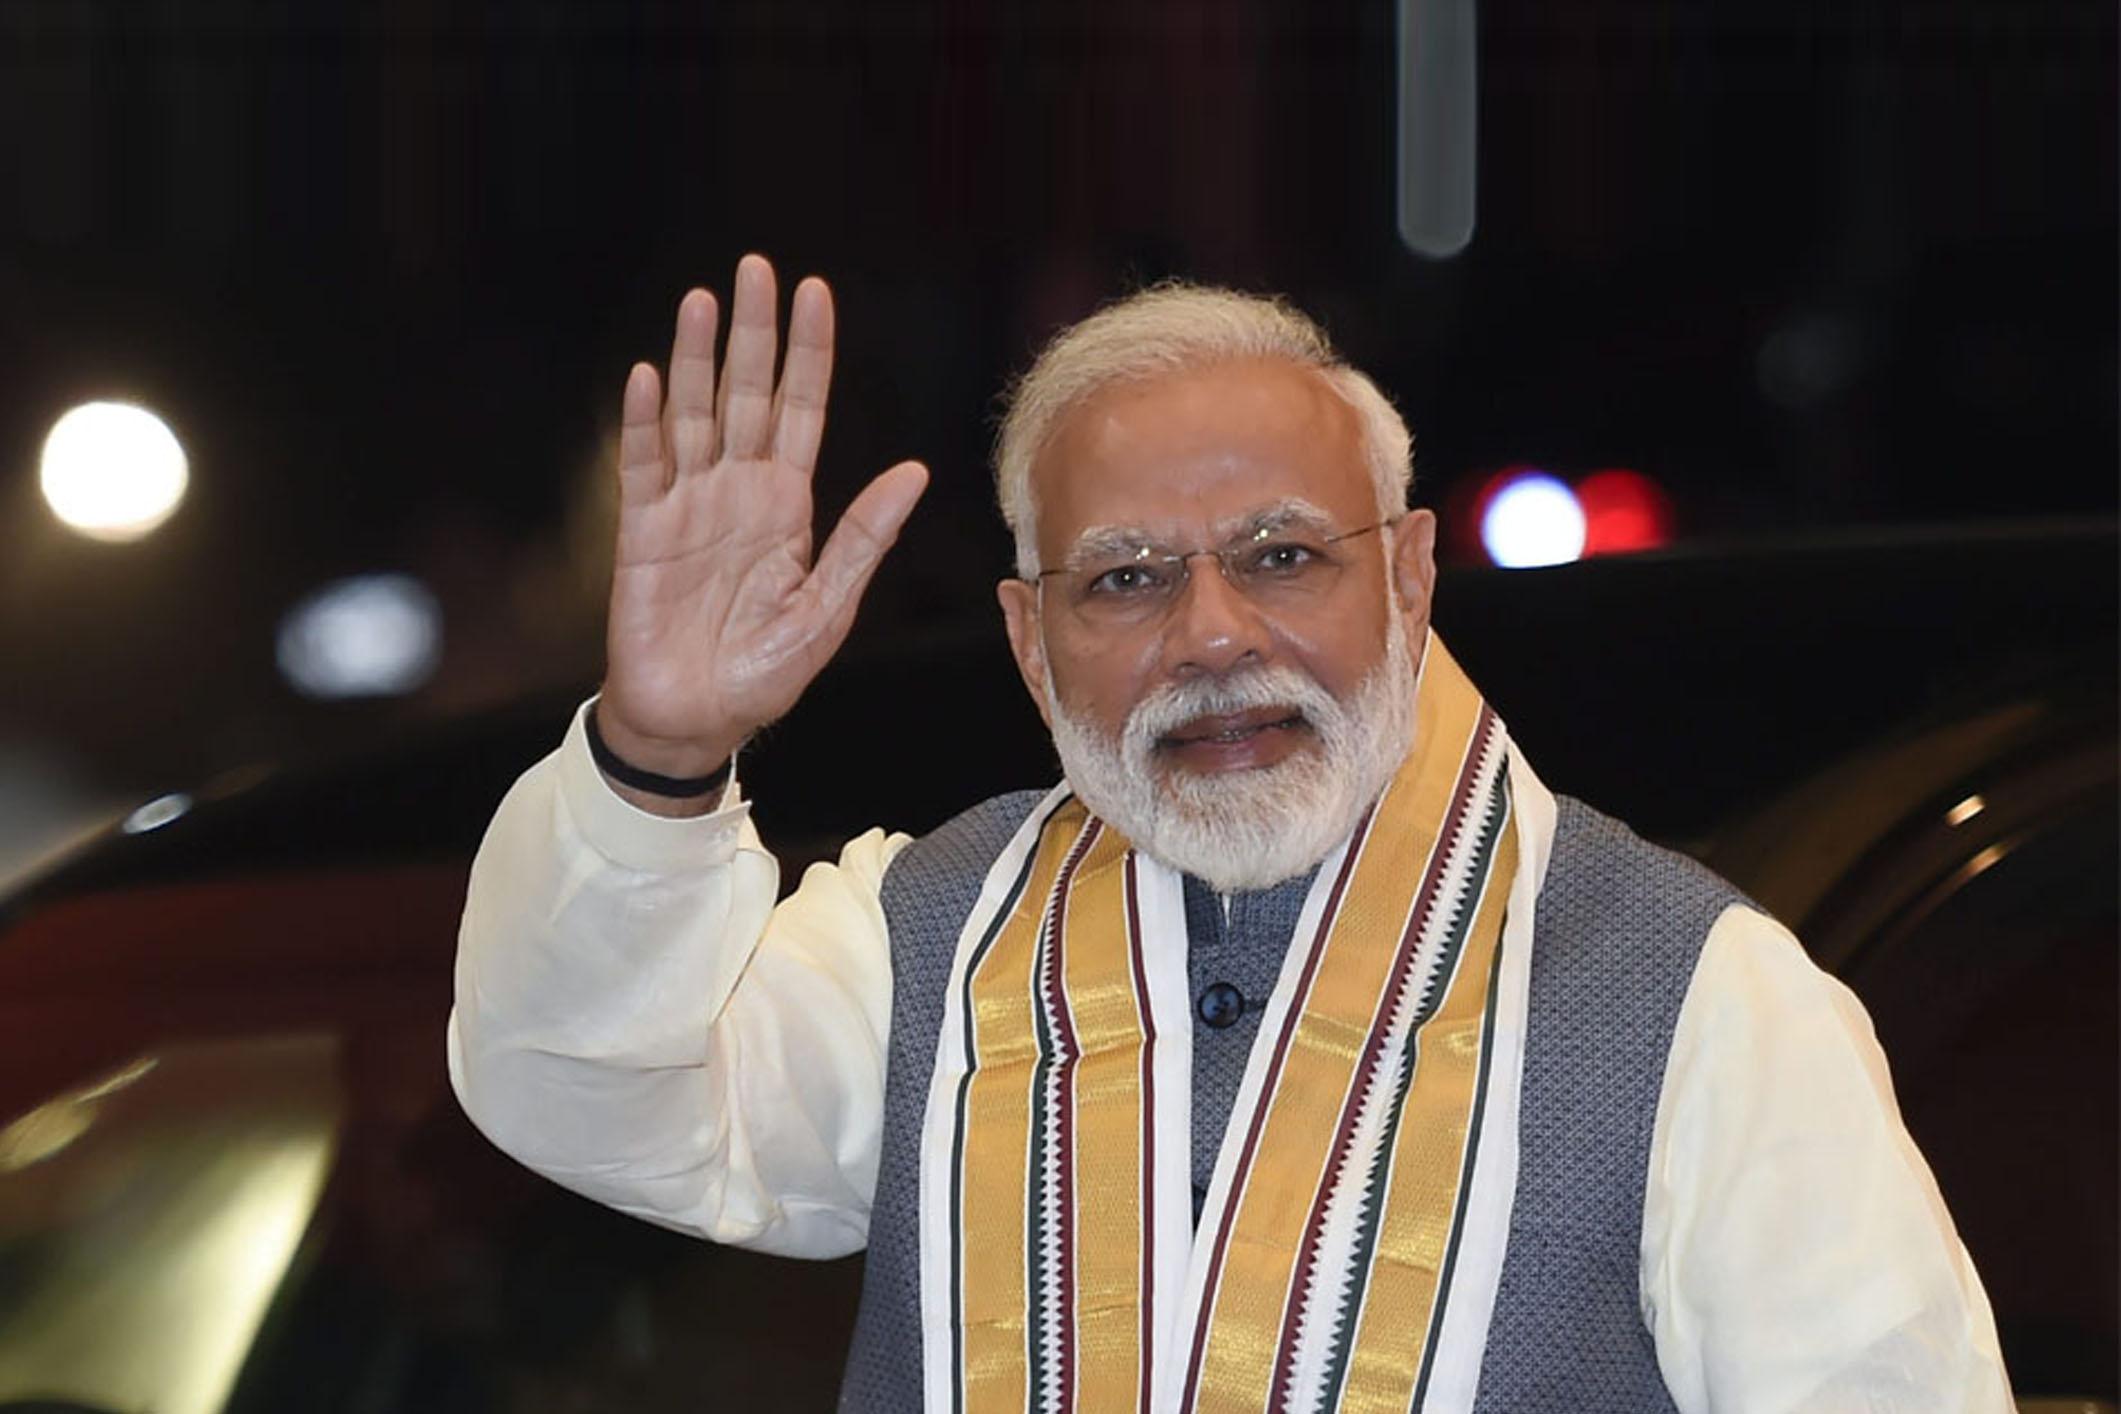 Narendra Modi to dedicate Rs 23,200 crore single largest investment in Kerala.